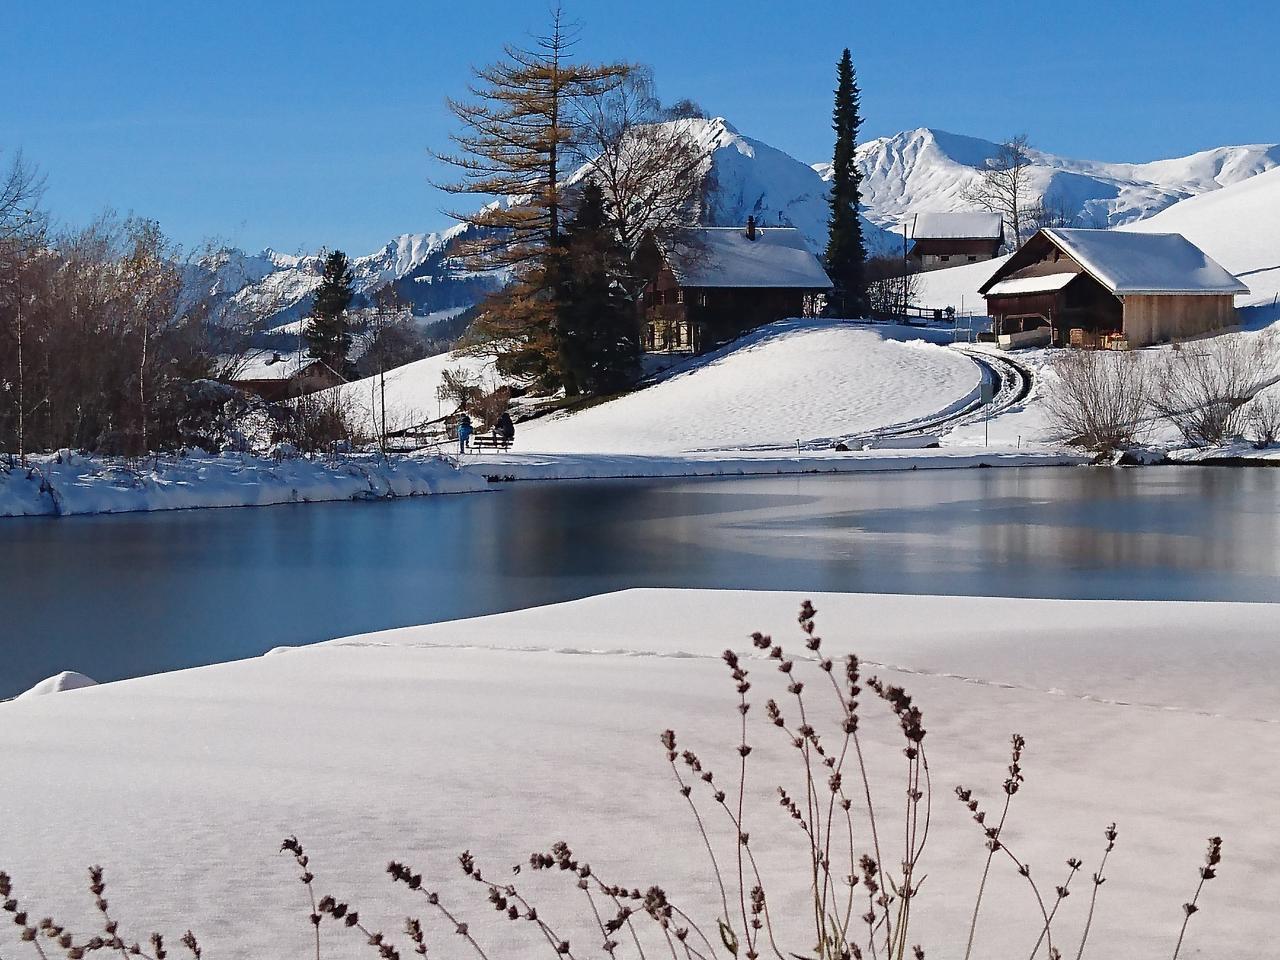 Ferienwohnung Obererli 4-Bettwohnung (2692316), Hasliberg Hohfluh, Meiringen - Hasliberg, Berner Oberland, Schweiz, Bild 15